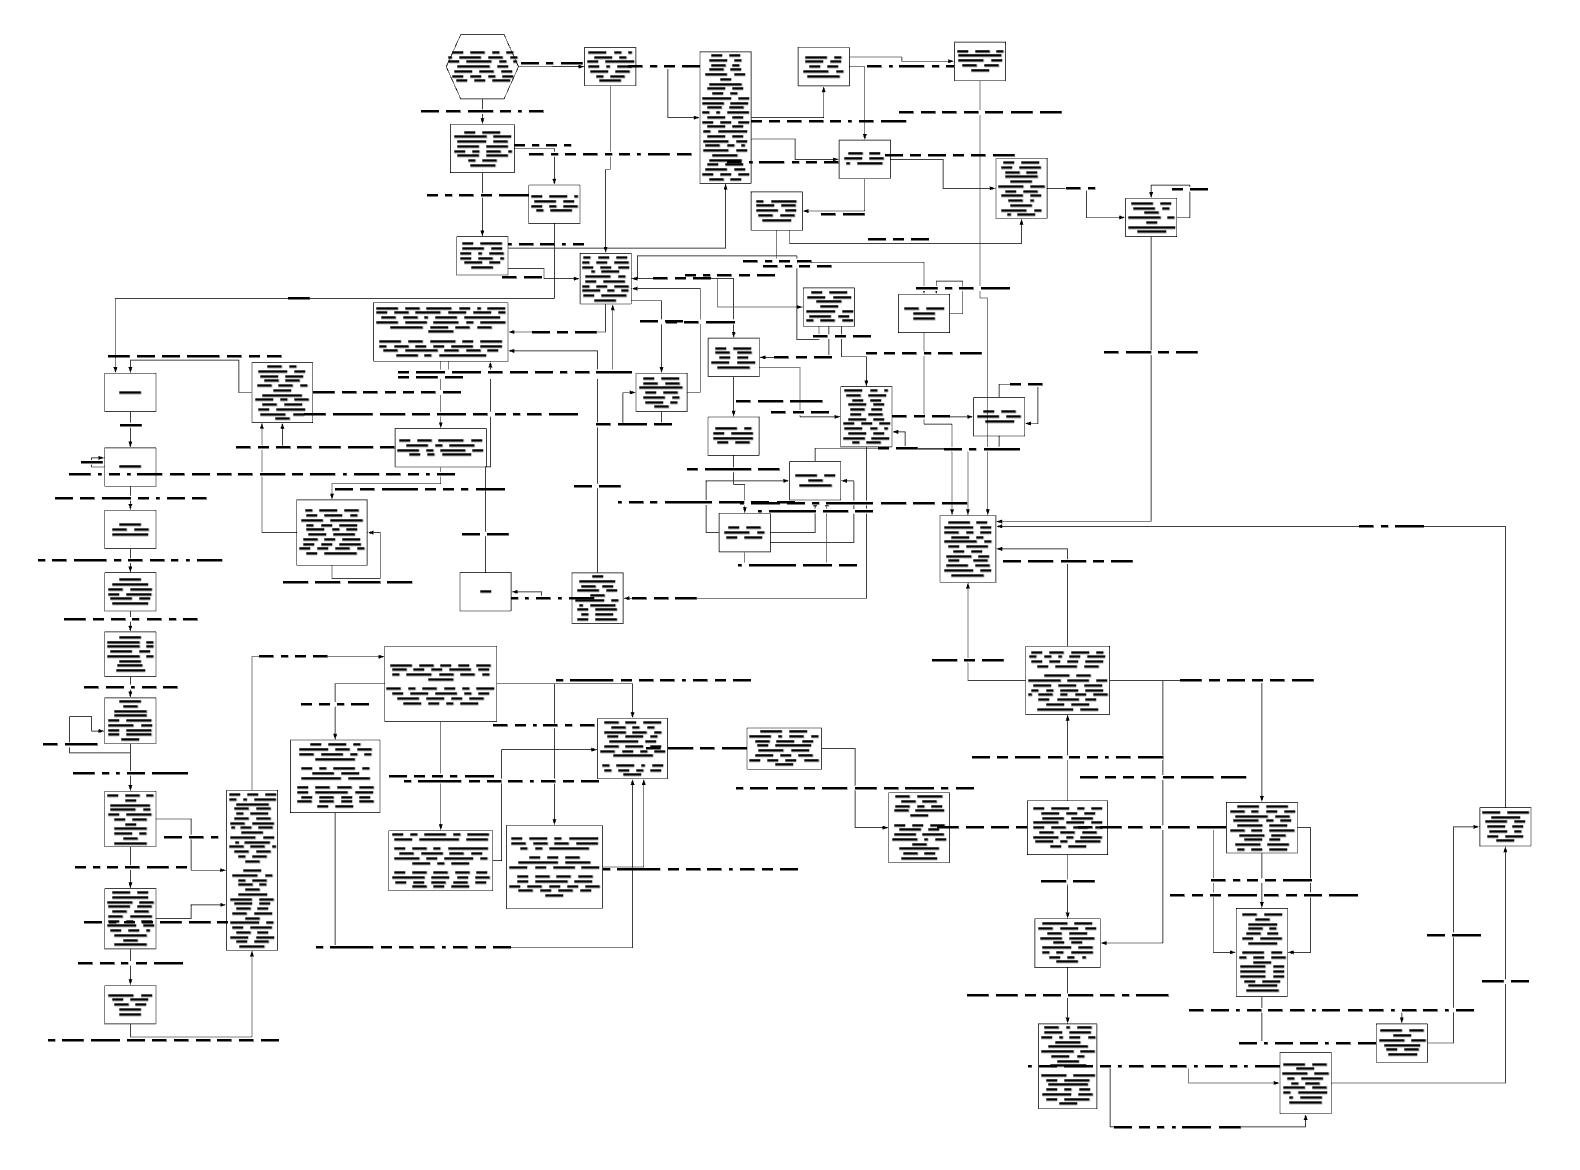 https://d33wubrfki0l68.cloudfront.net/4532f852f7e1ee4e64e56c317cde73900e12b60b/1815c/lucidchart-visual-reasoning/untitled.png